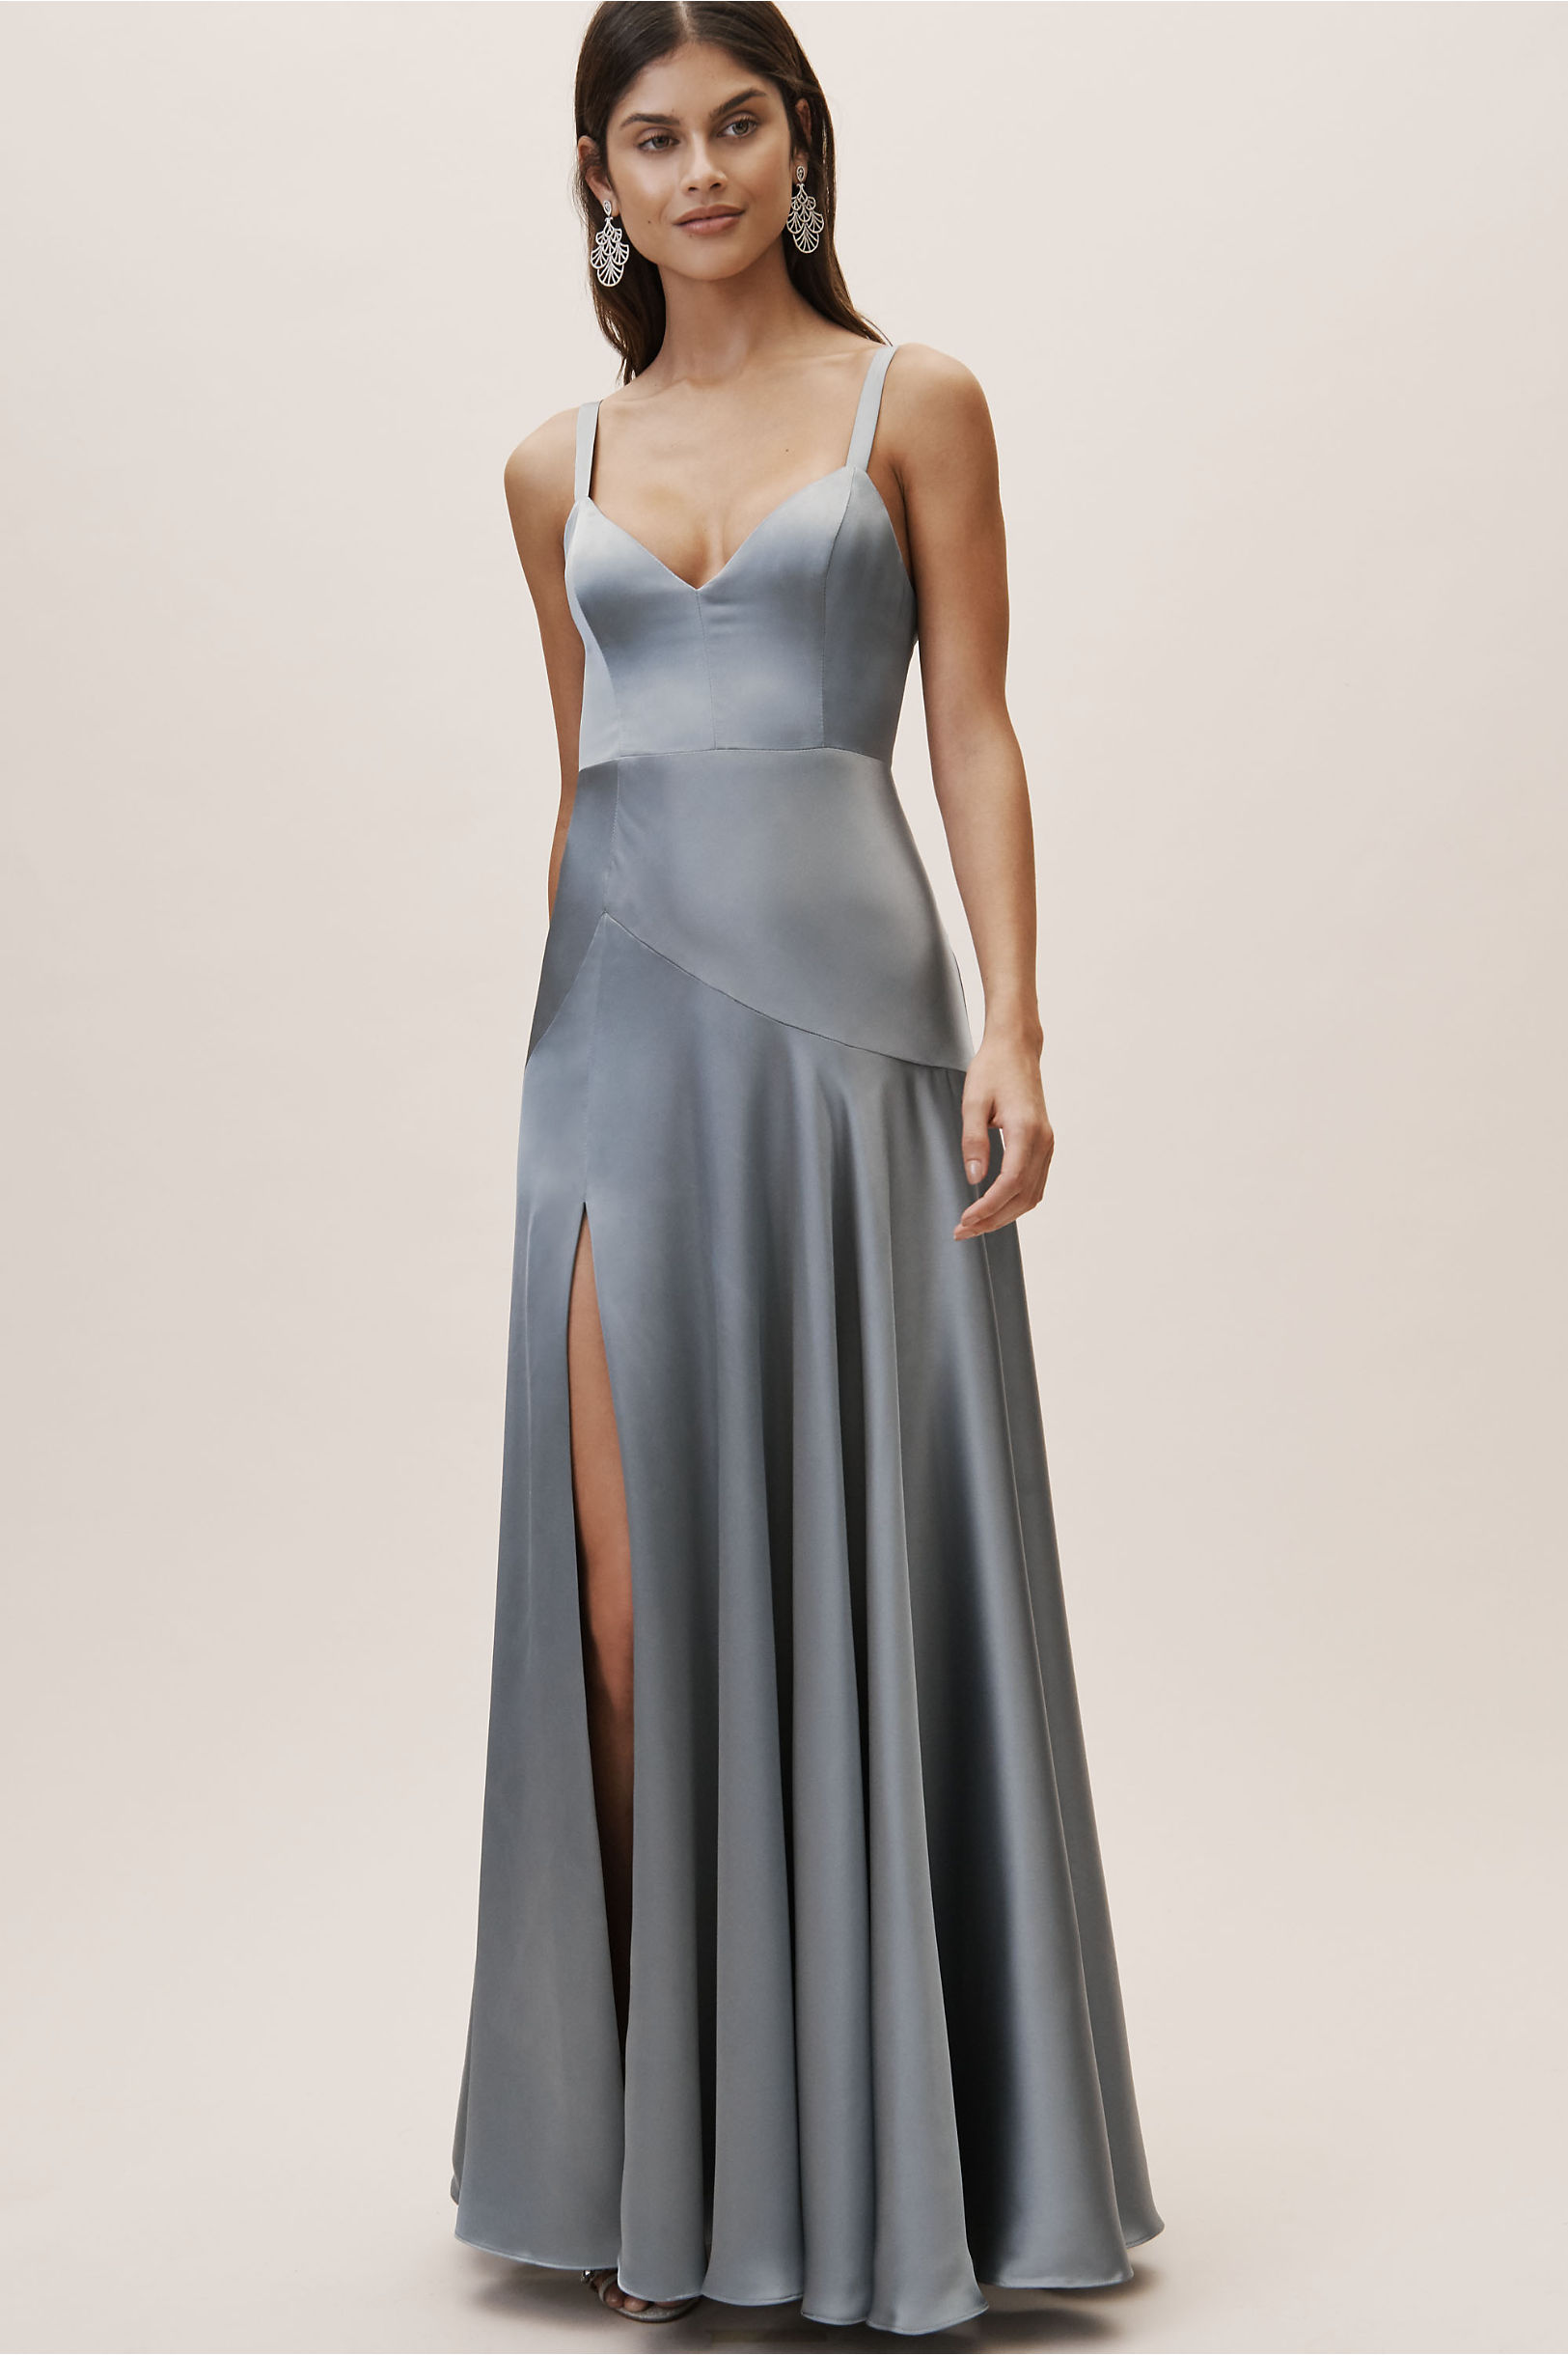 0157f713eaad5 Fame and Partners Dusty Blue Watkins Dress | BHLDN